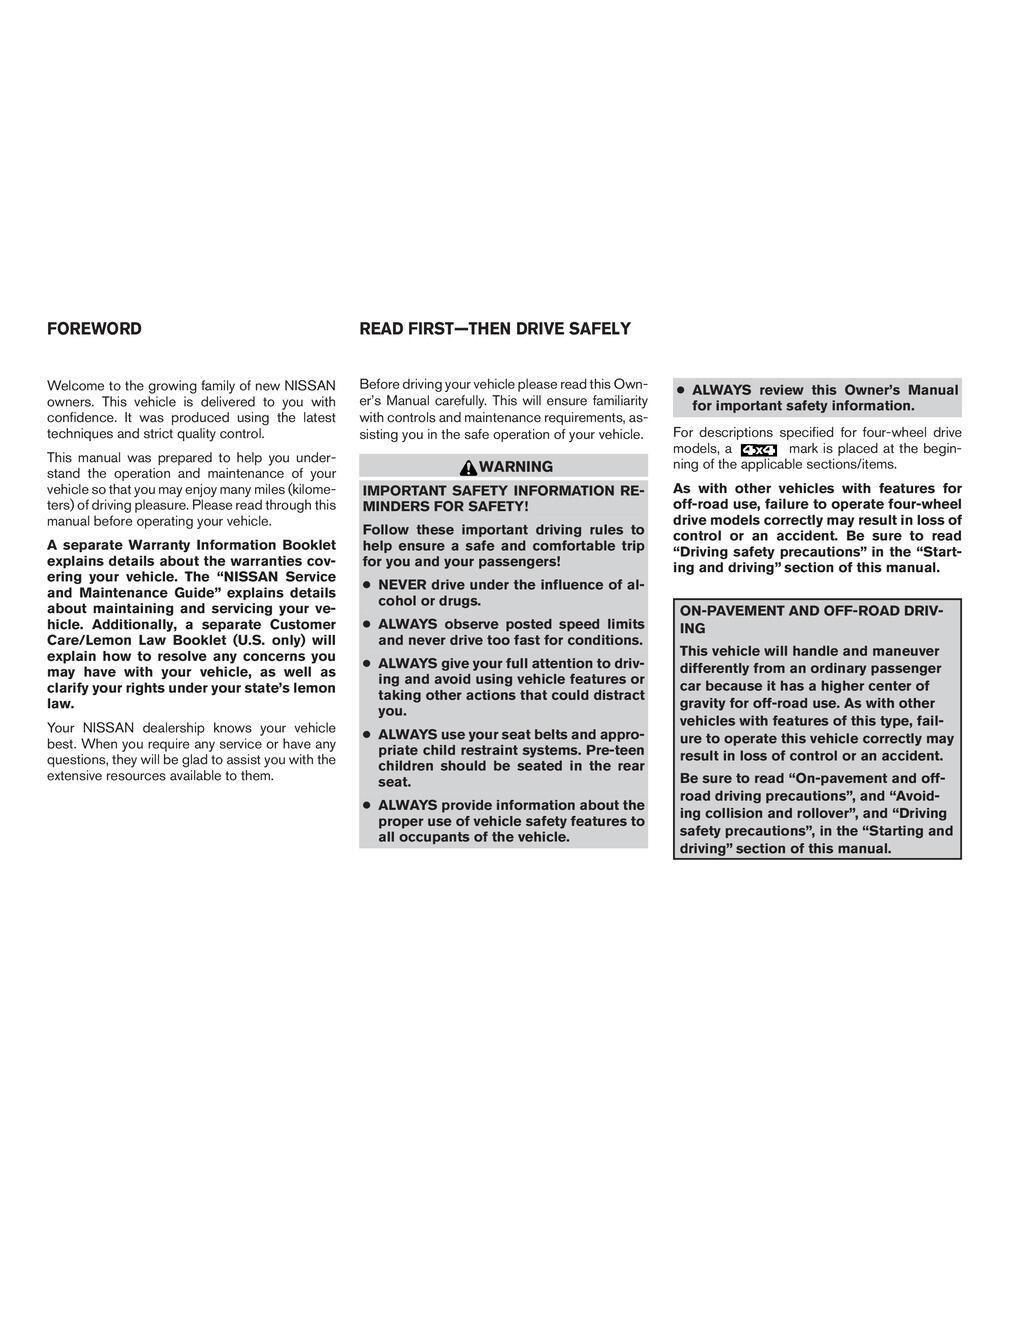 2007 Nissan Xterra owners manual